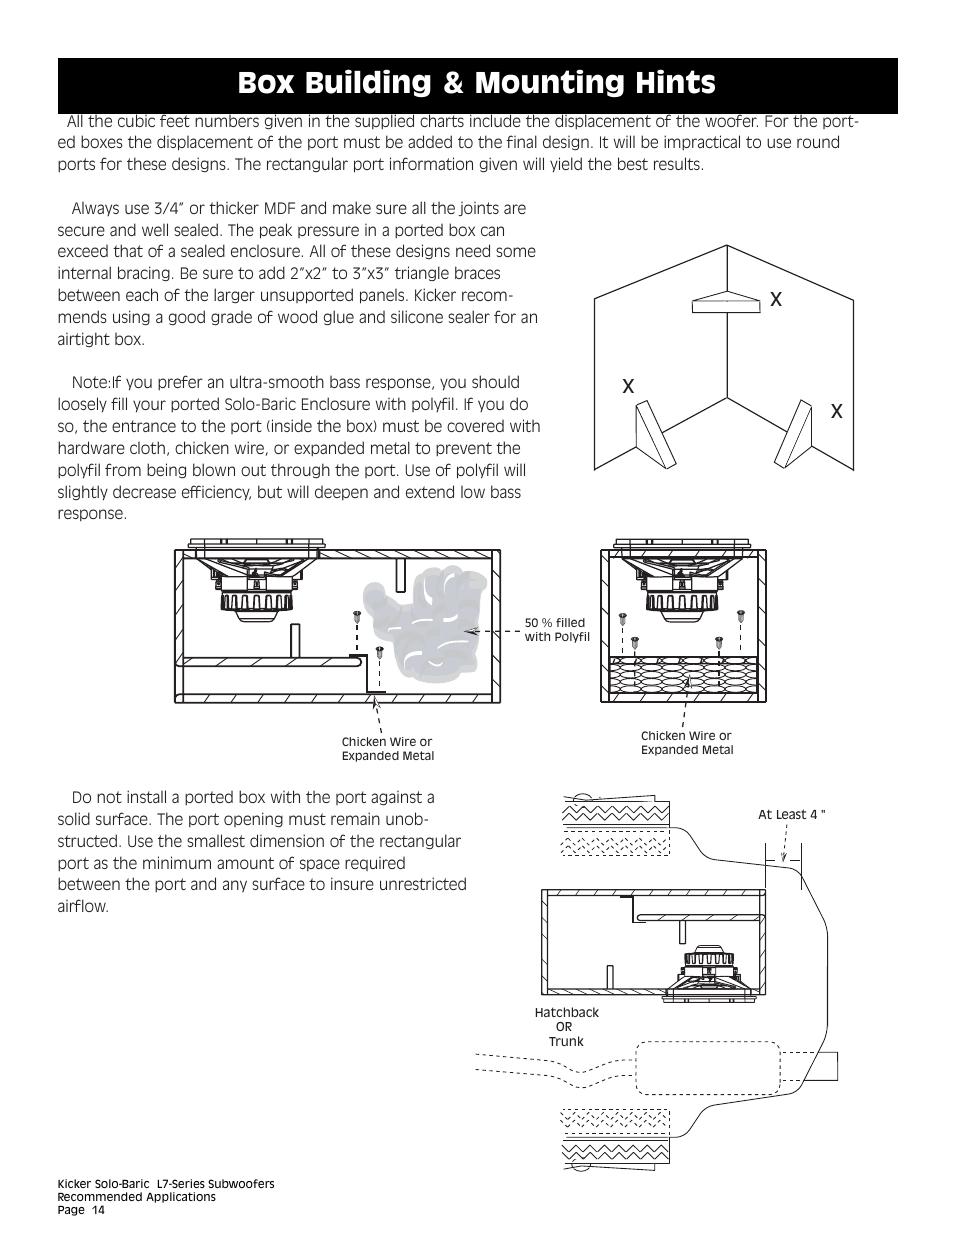 Box building & mounting hints | Kicker L7 User Manual | Page 14 / 36